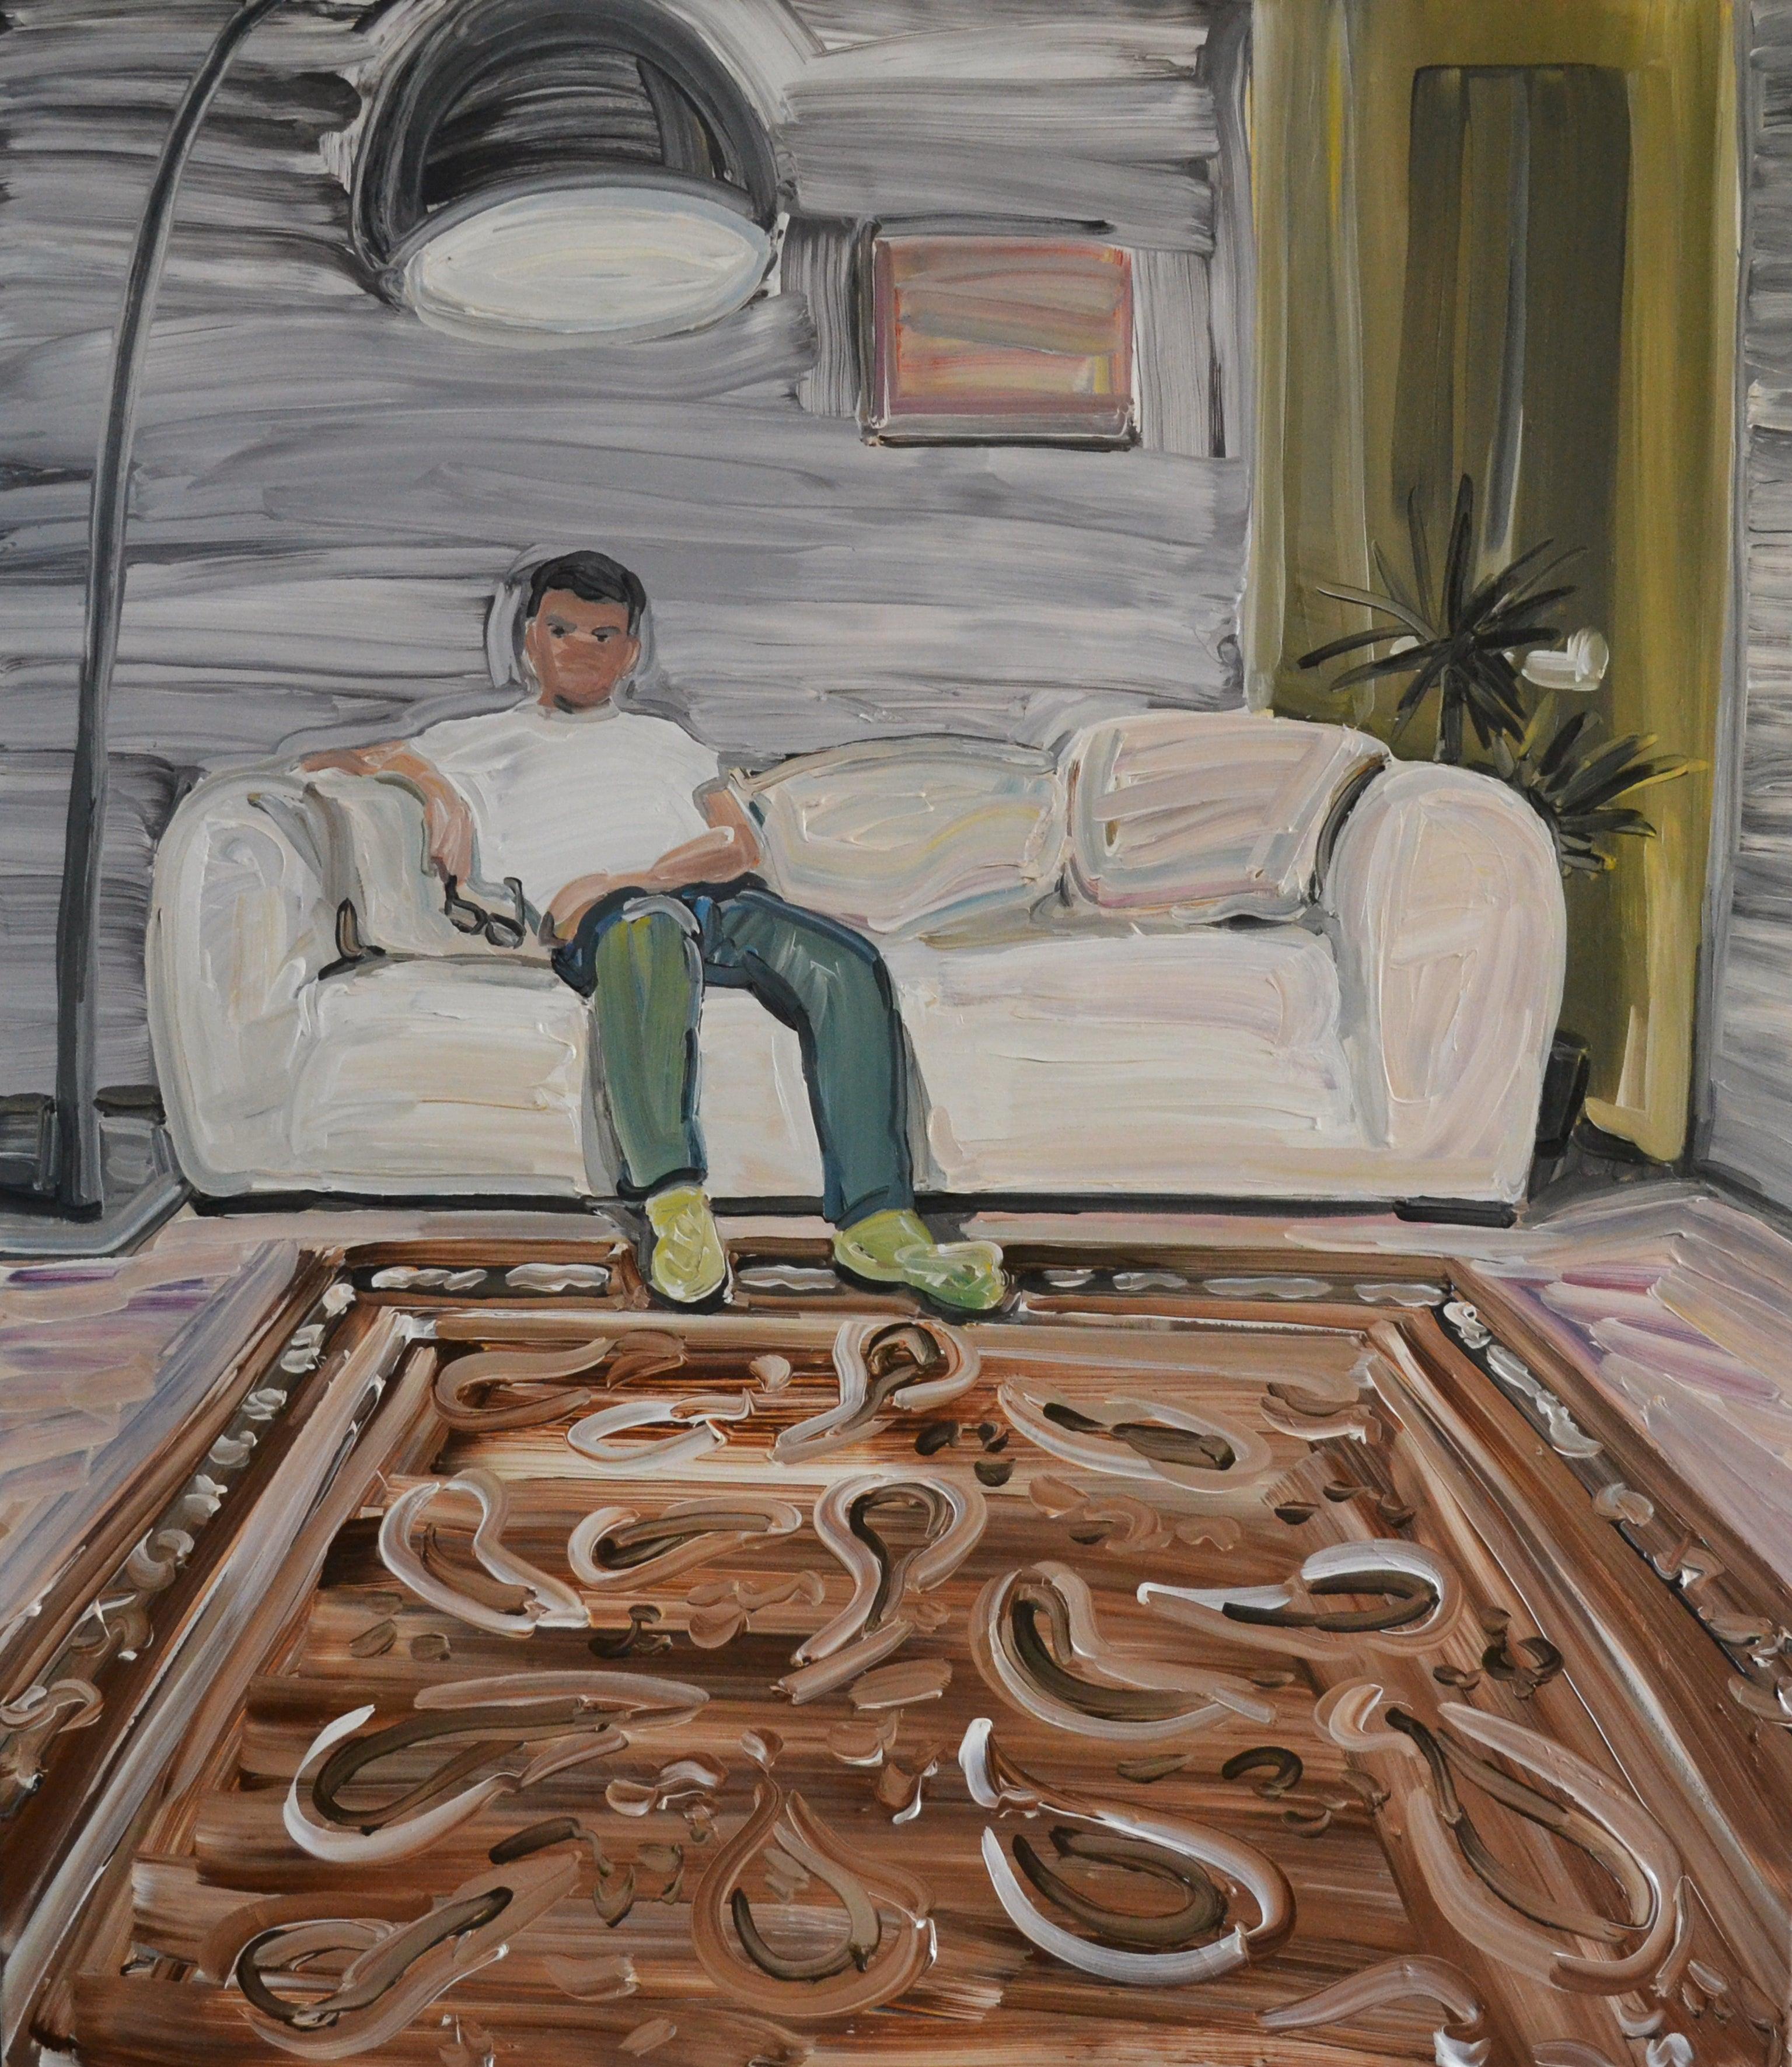 Mirek - Male Portrait, Contemporary Expressive Figurative Oil Painting